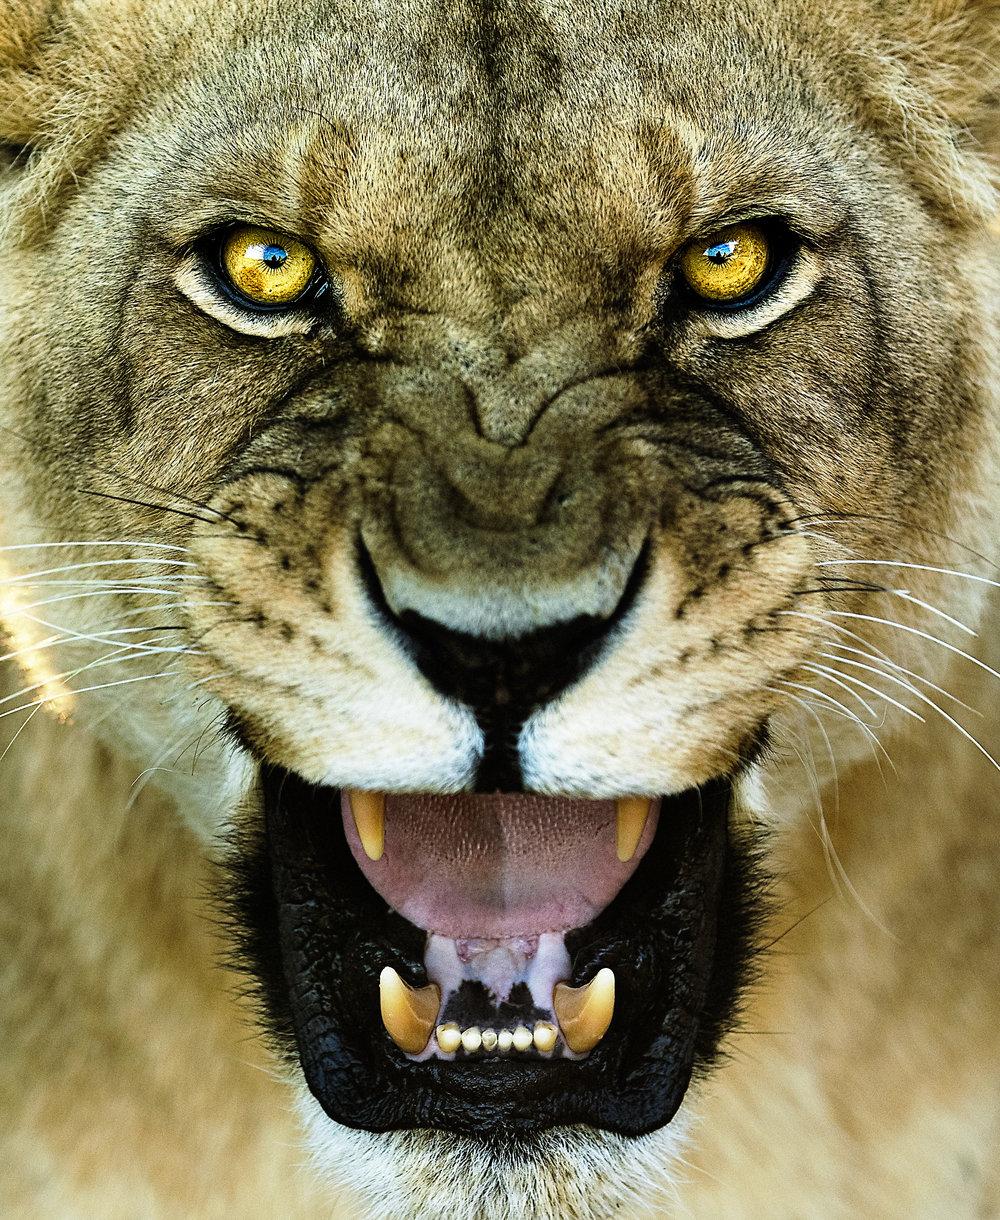 Simon+Needham+Humanitarian+Photography+Lions+of+Africa+2.jpg